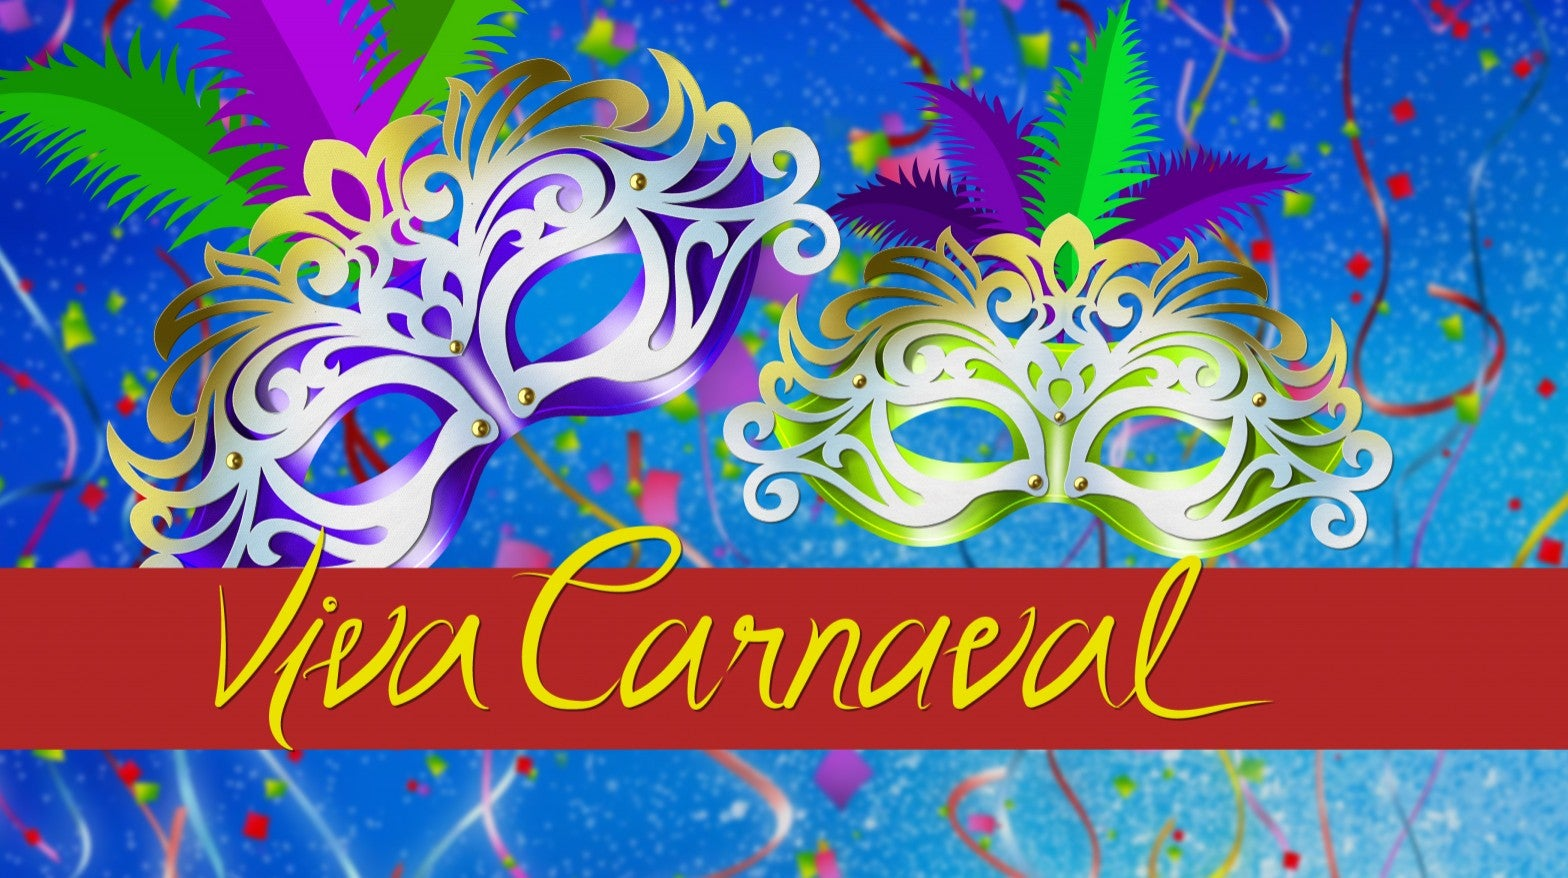 Viva Carnaval